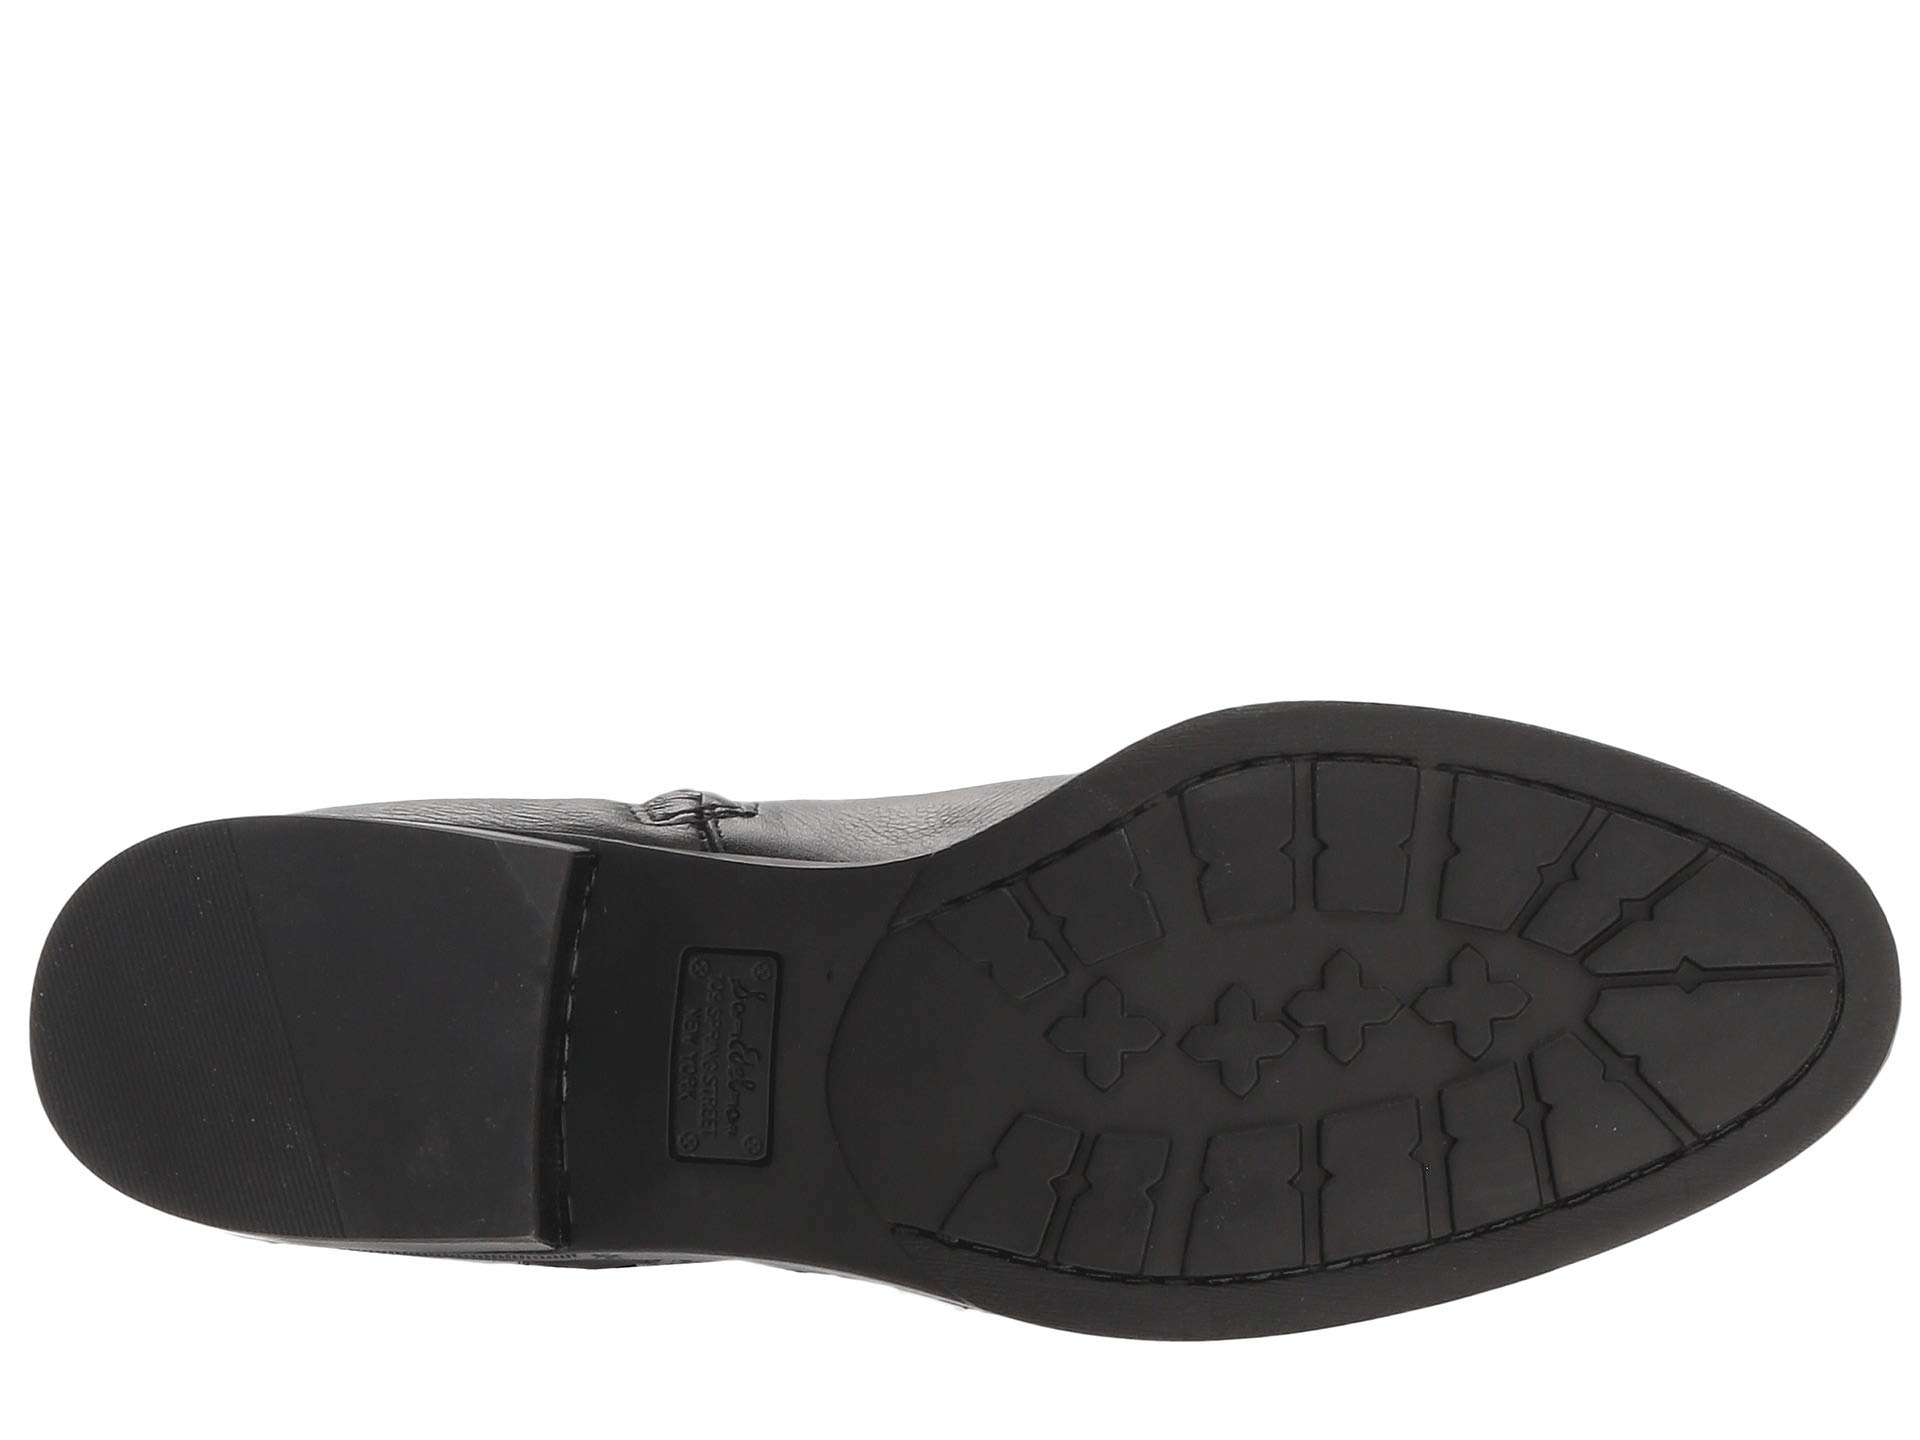 Black Boot Wide Leather Prina Neymar Sam Calf Edelman Tall TxwY0OpEqp